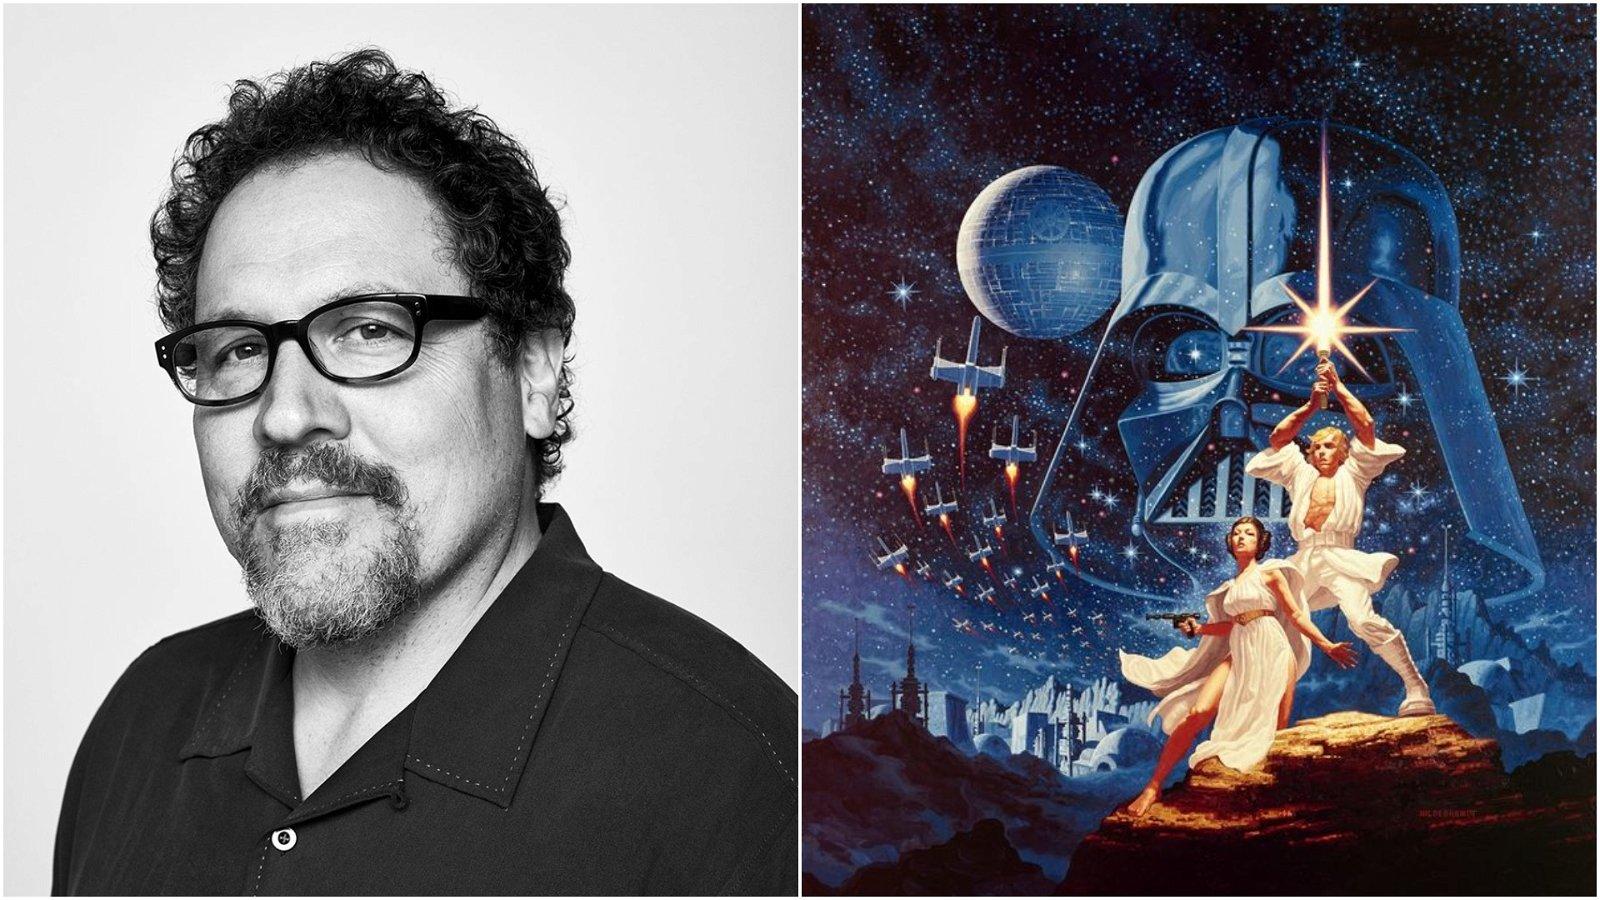 New Star Wars TV Series Coming from Jungle Book Director Jon Favreau 1